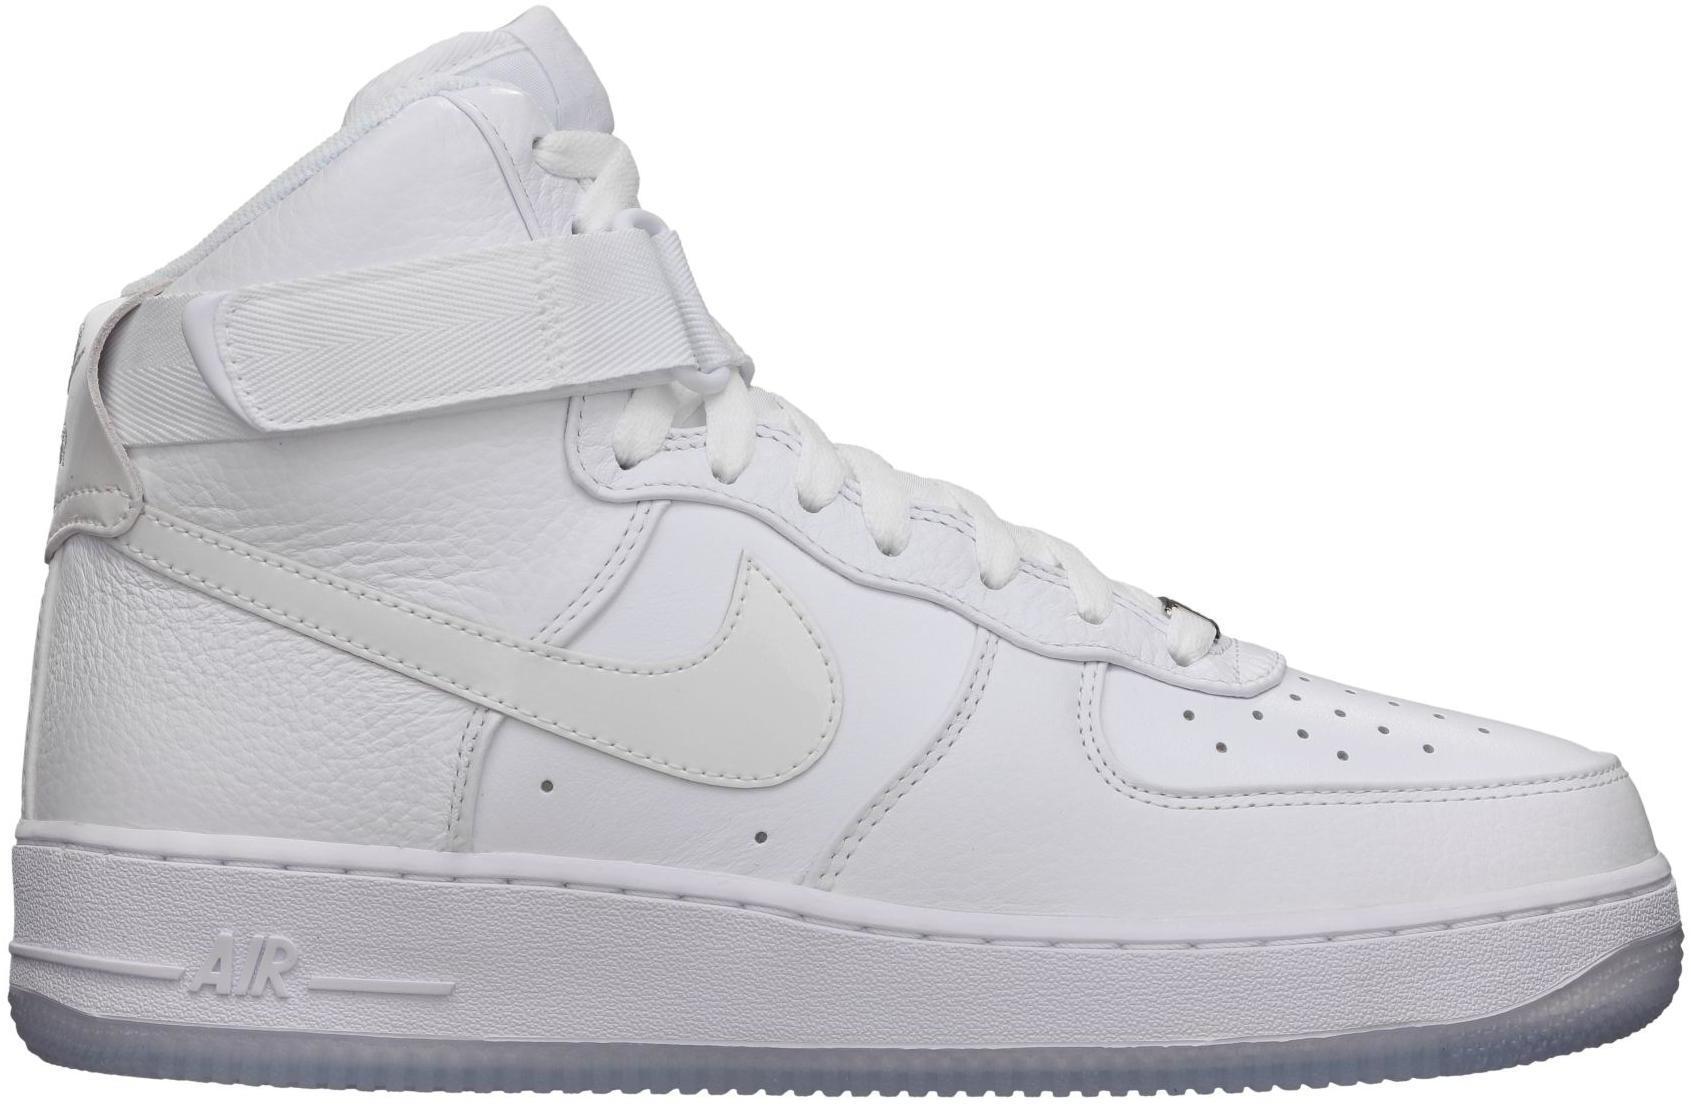 Nike Air Force 1 High Triple White Ice